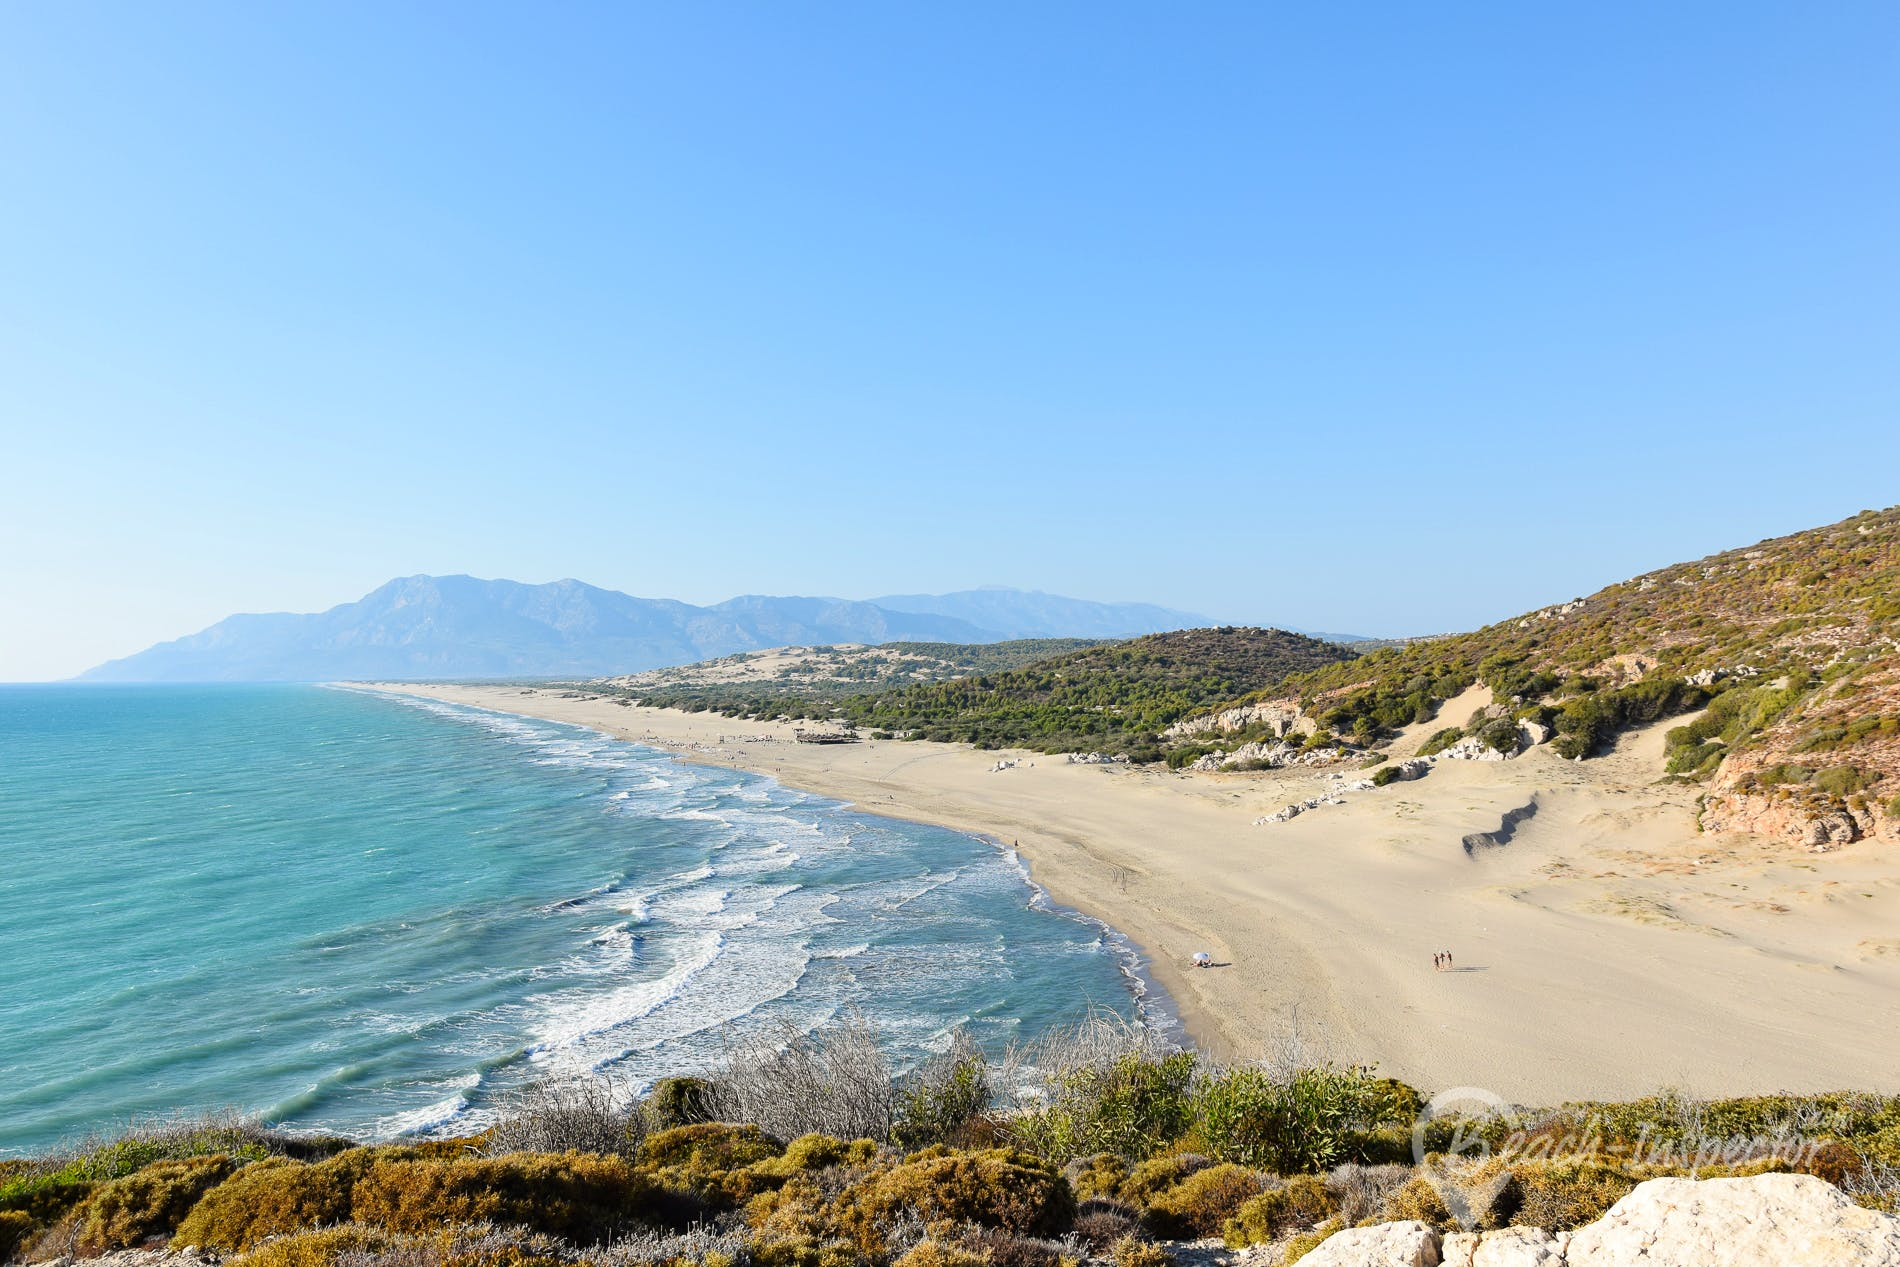 Playa Patara Beach, Turquía, Turquía